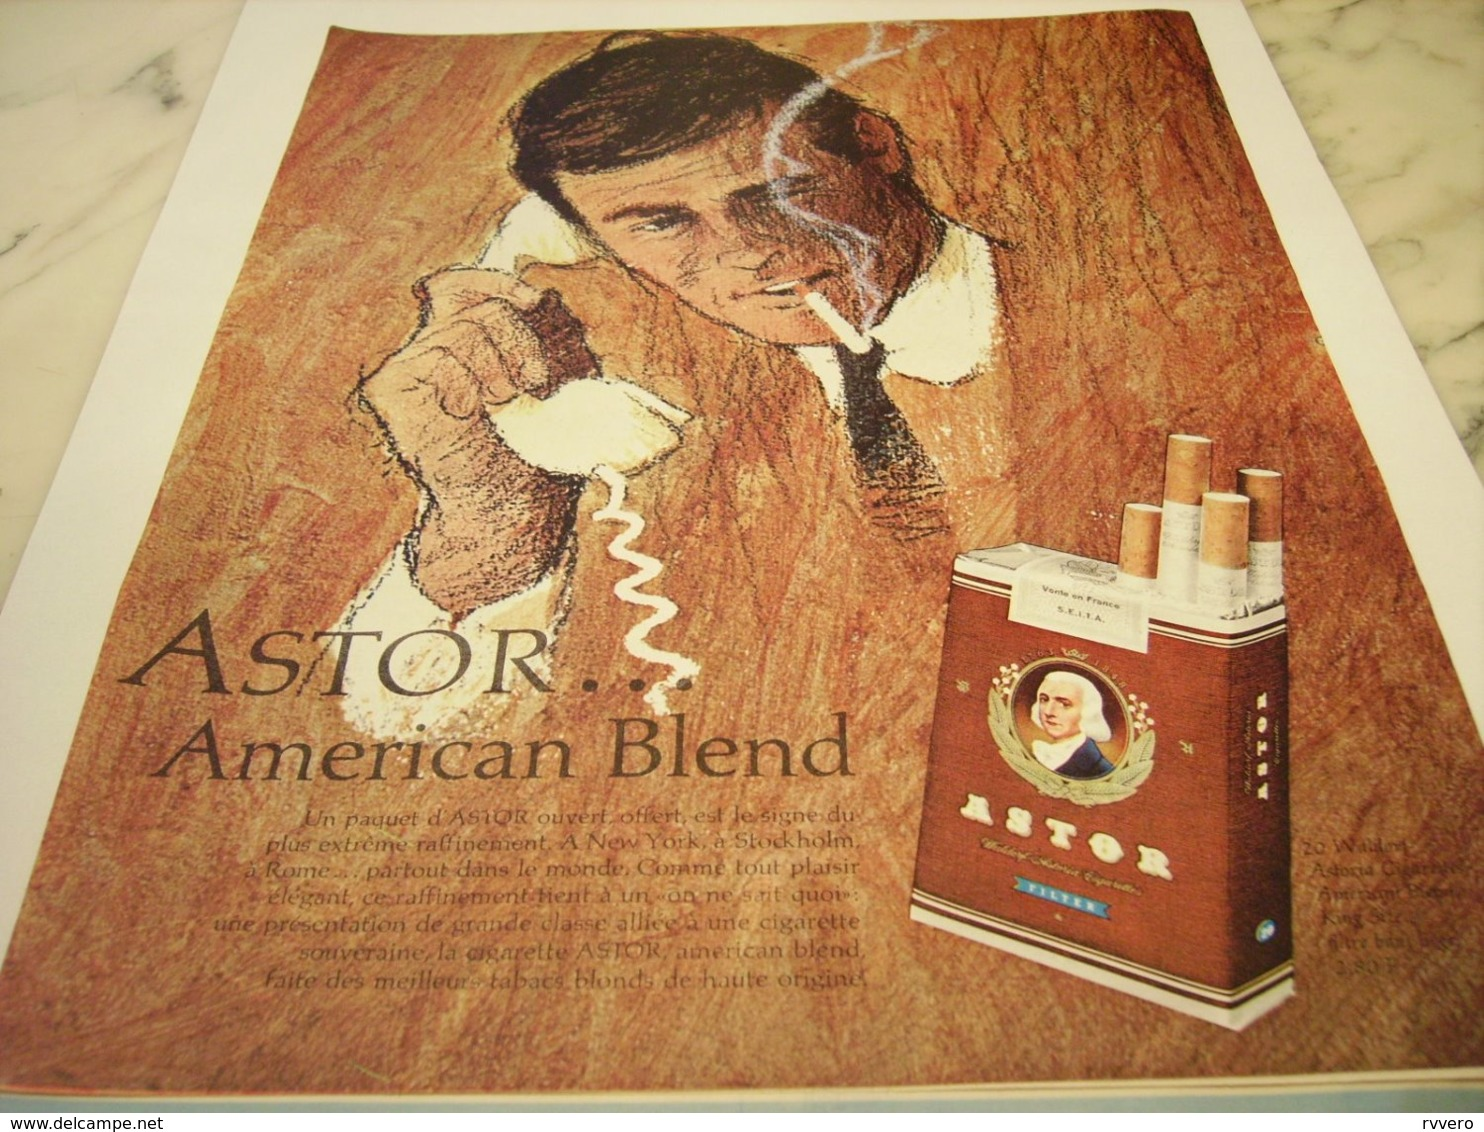 ANCIENNE PUBLICITE CIGARETTE ASTOR AMERICAN BLEND 1964 - Raucherutensilien (ausser Tabak)